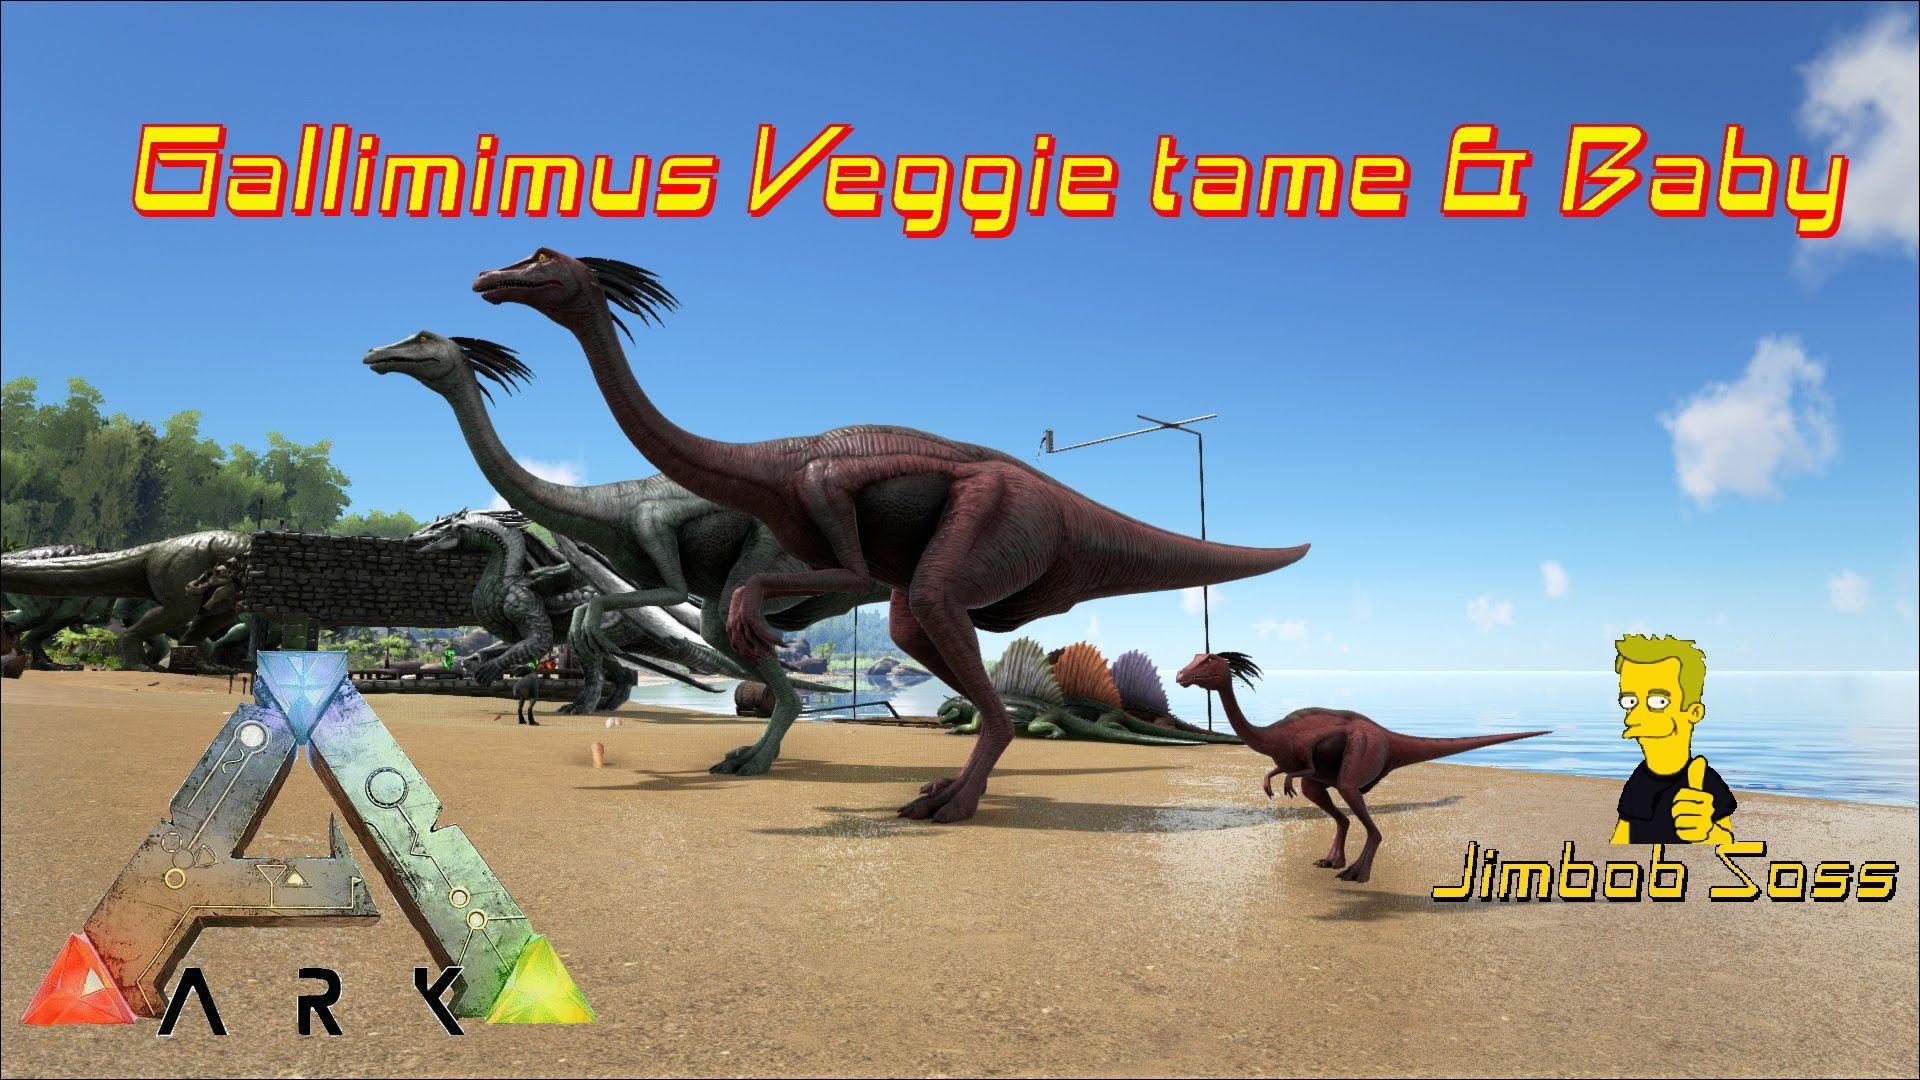 Ark Survival Evolved Gallimimus Veggie Tame Baby Ark Survival Evolved Ark Survival